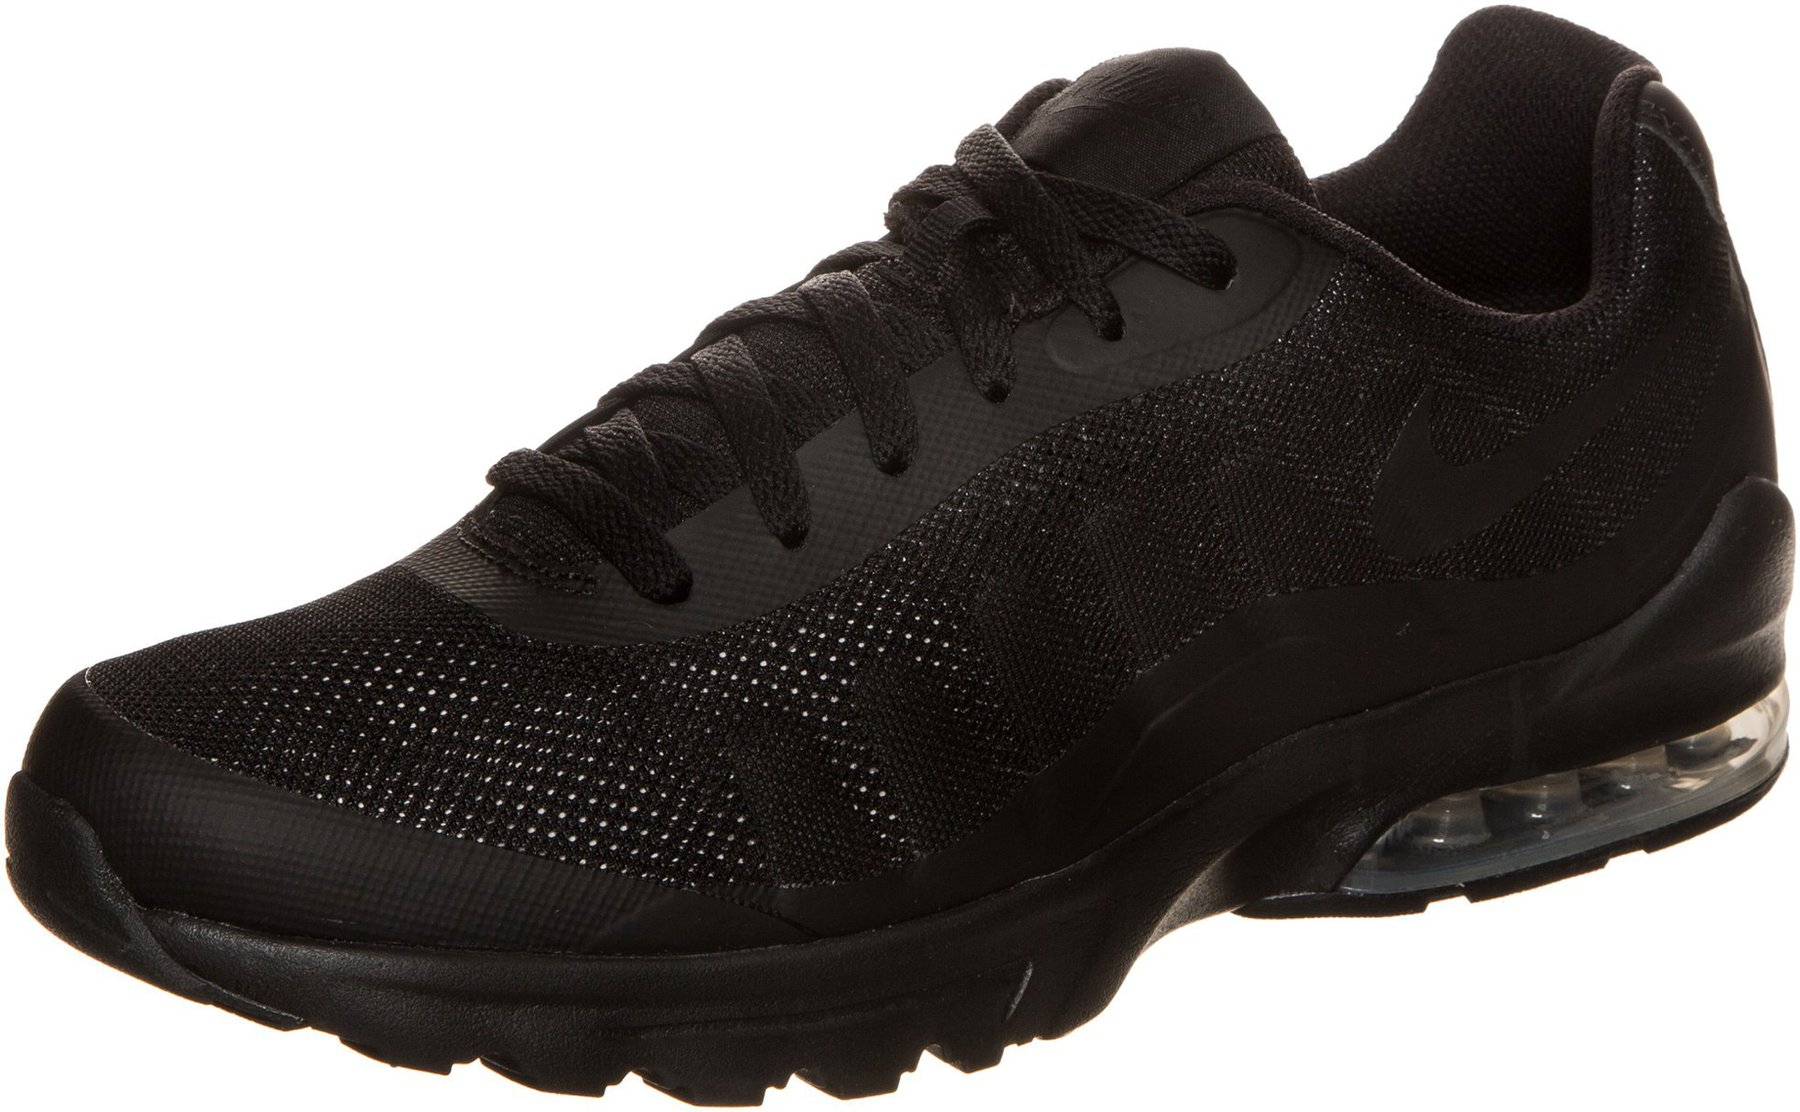 factory authentic 0cf62 99cbf Nike Air Max Invigor ab 55 € günstig im Preisvergleich kaufen